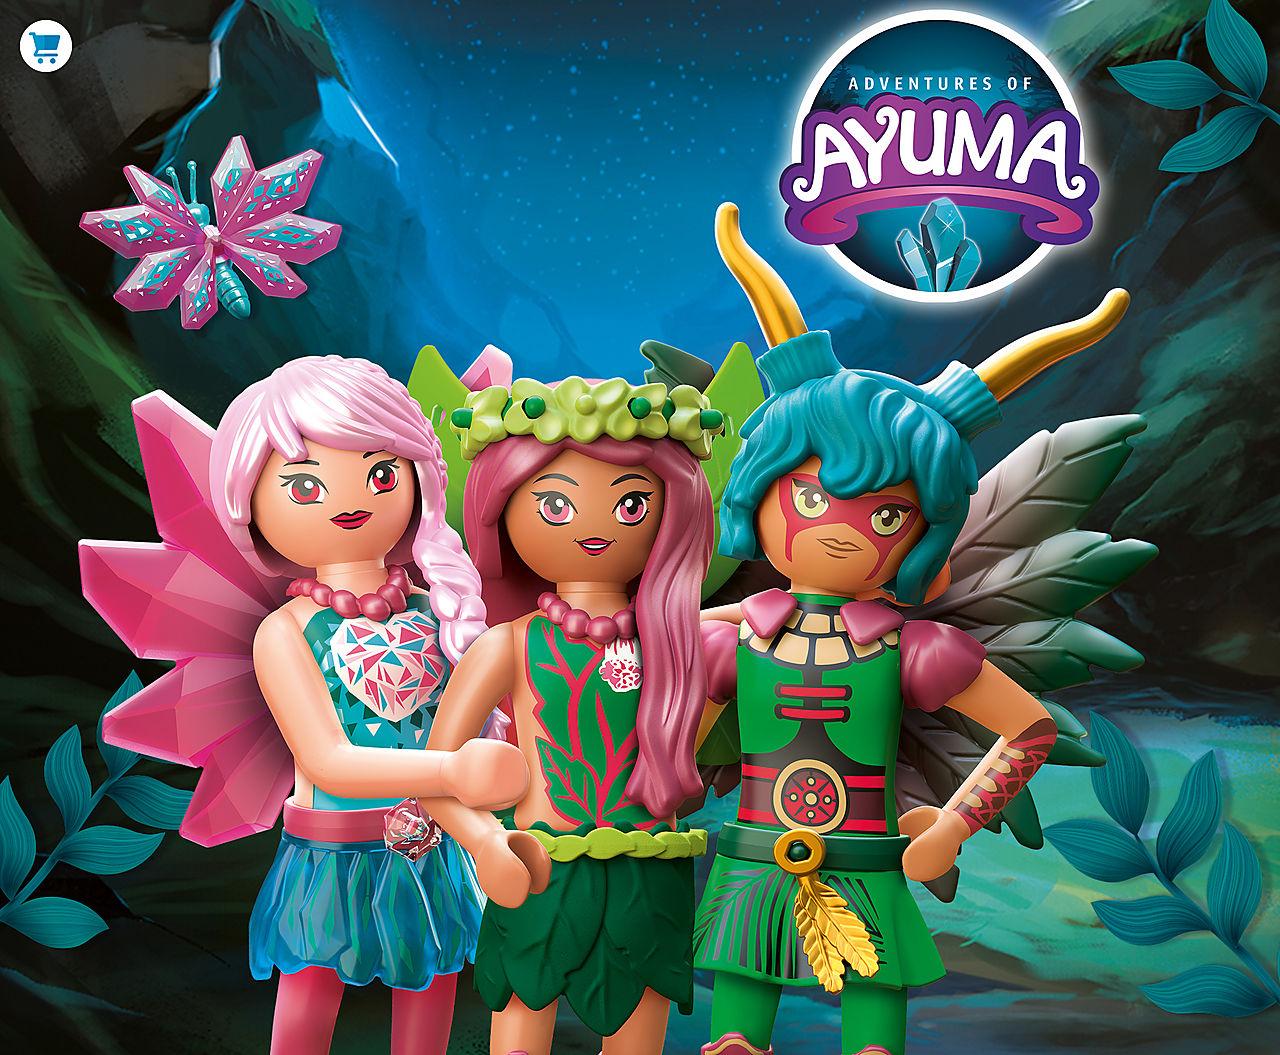 Adventures of Ayuma